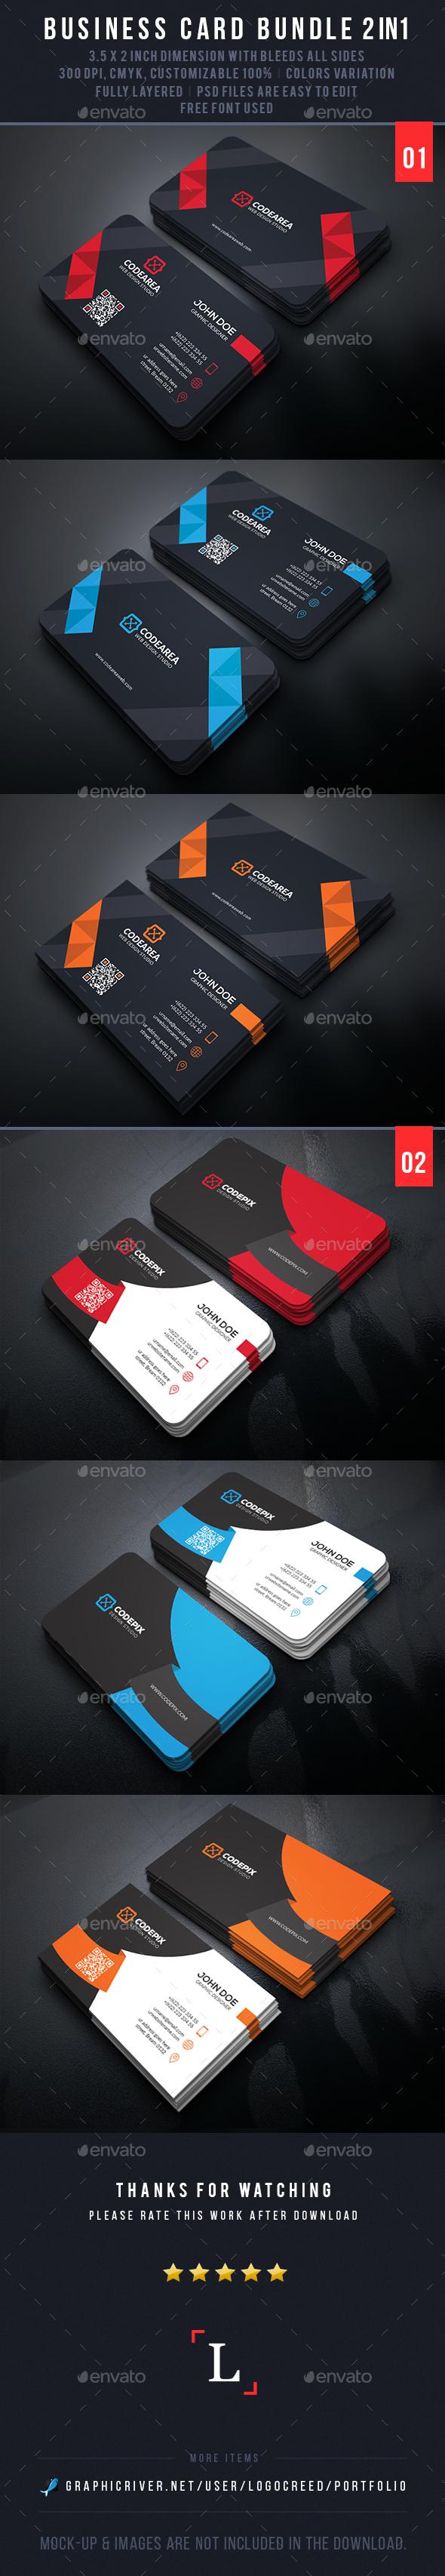 Mega Business Card Bundle - Business Cards Print Templates